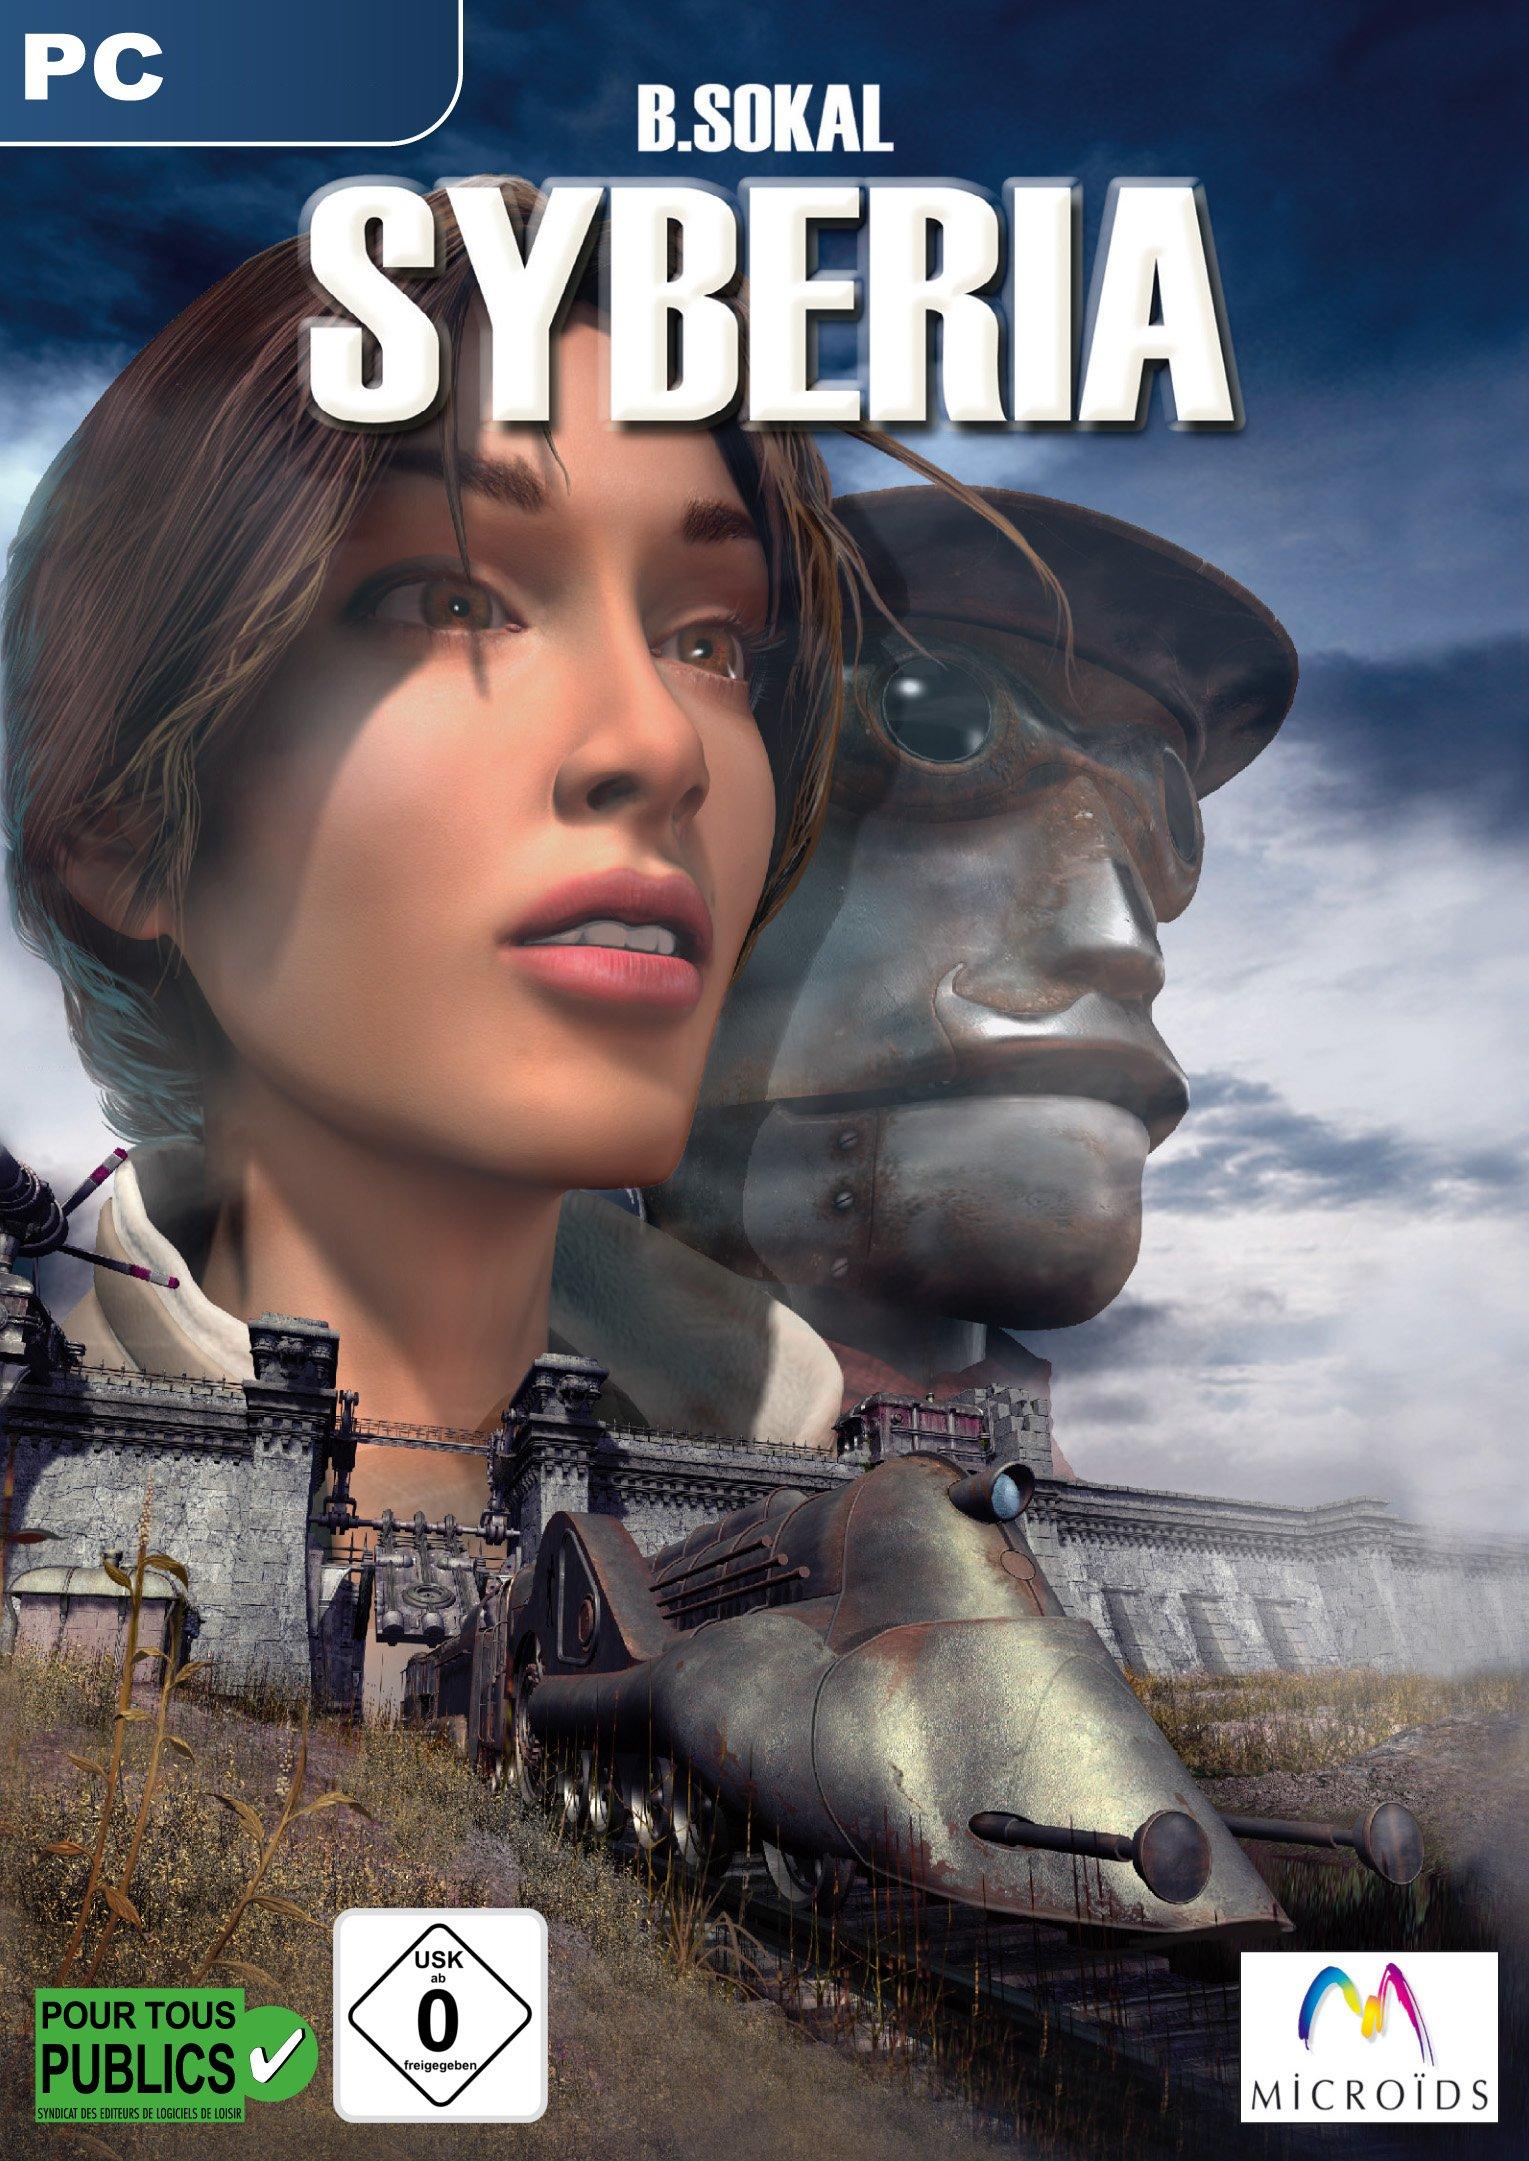 Syberia [PC/Mac Code - Steam] product image